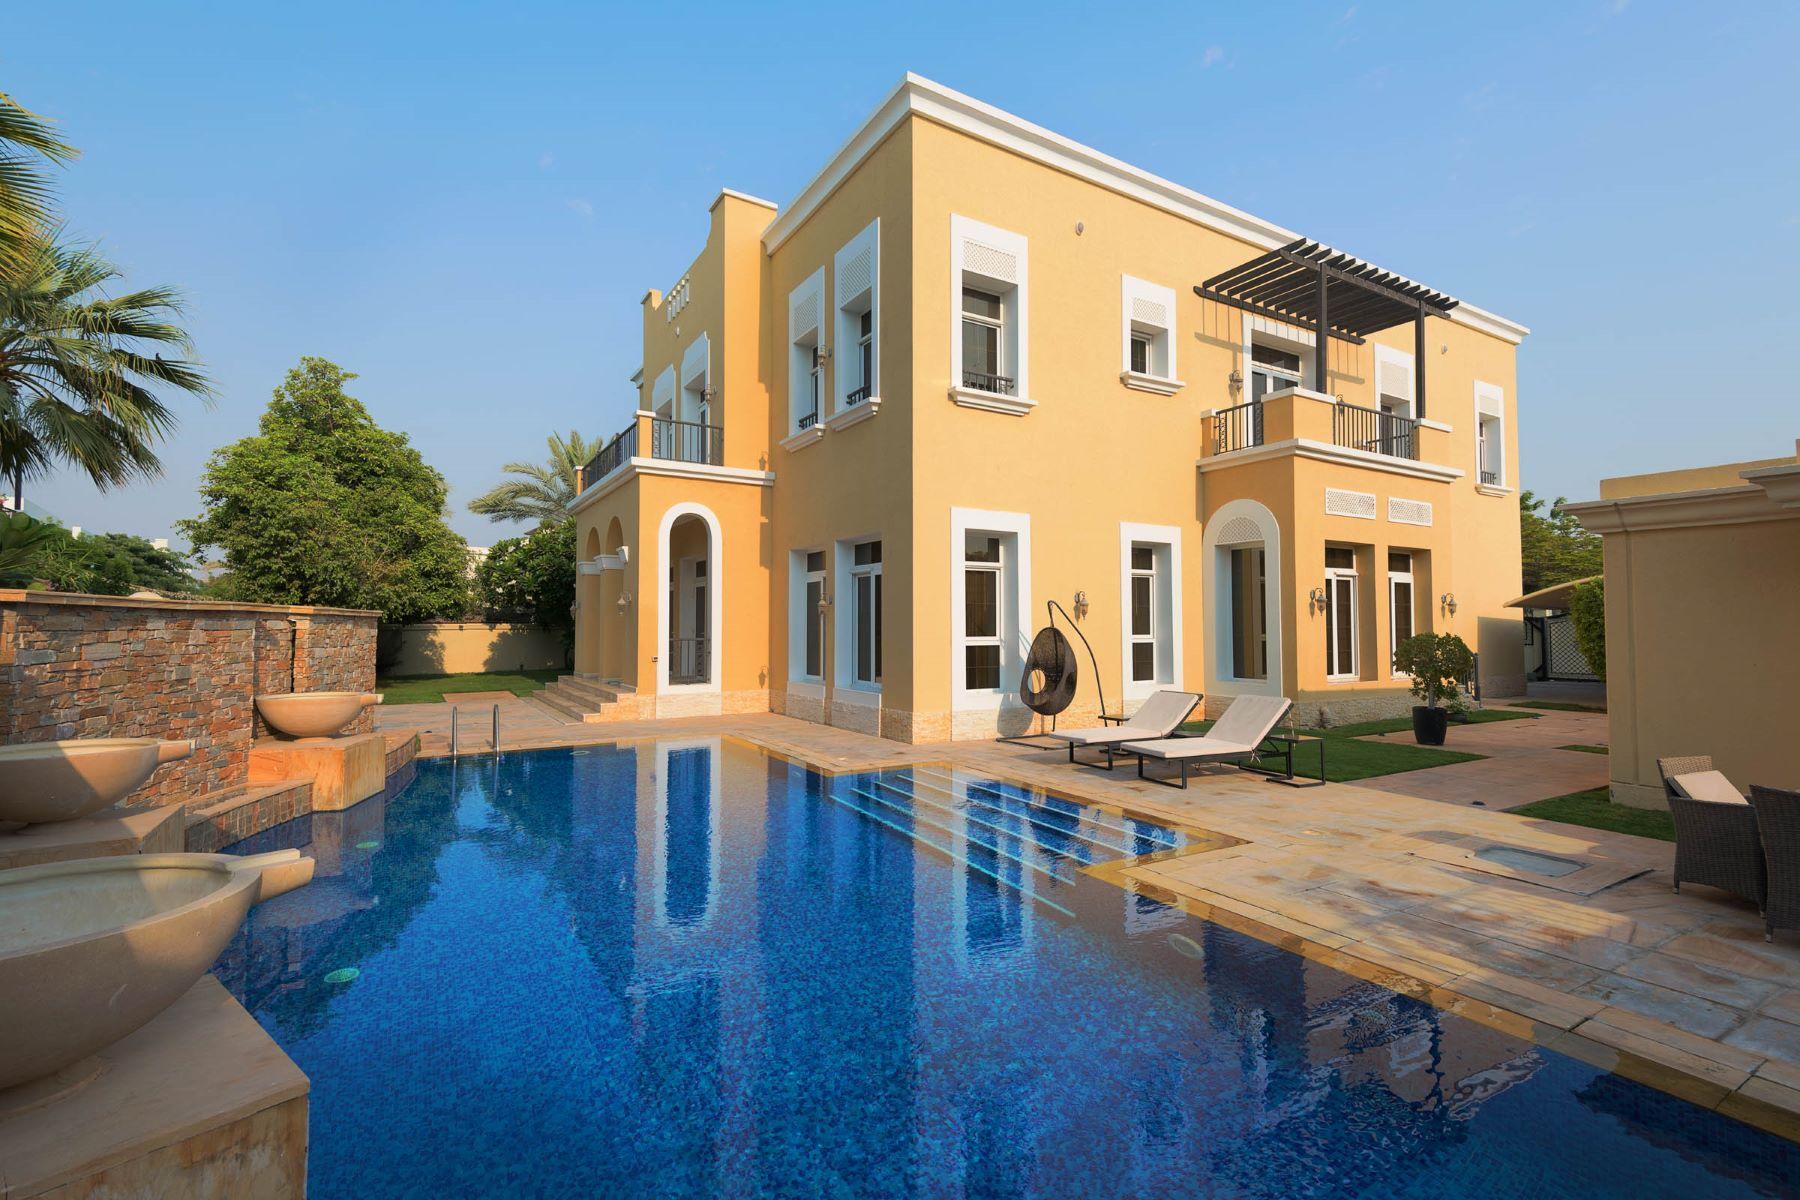 Other Residential Homes for Sale at 5 Bedroom l Luxury Villa l Emirates Hills Dubai, Dubai United Arab Emirates